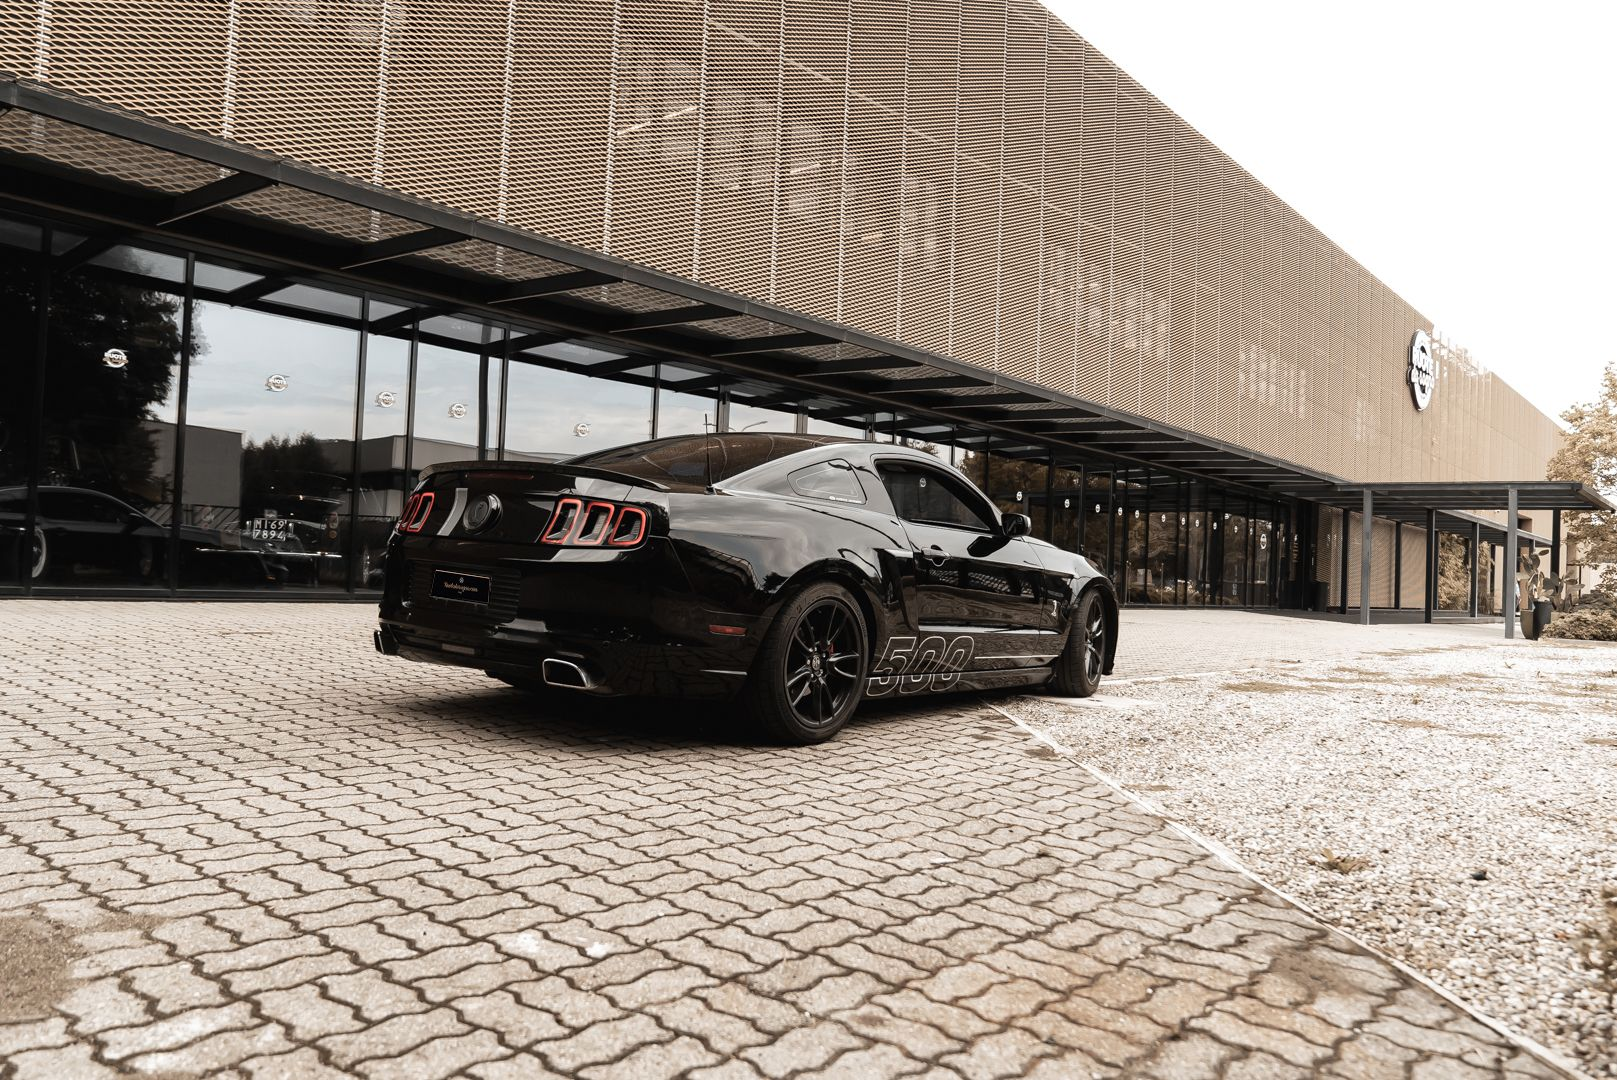 2012 Ford Mustang 5.0 V8 82052